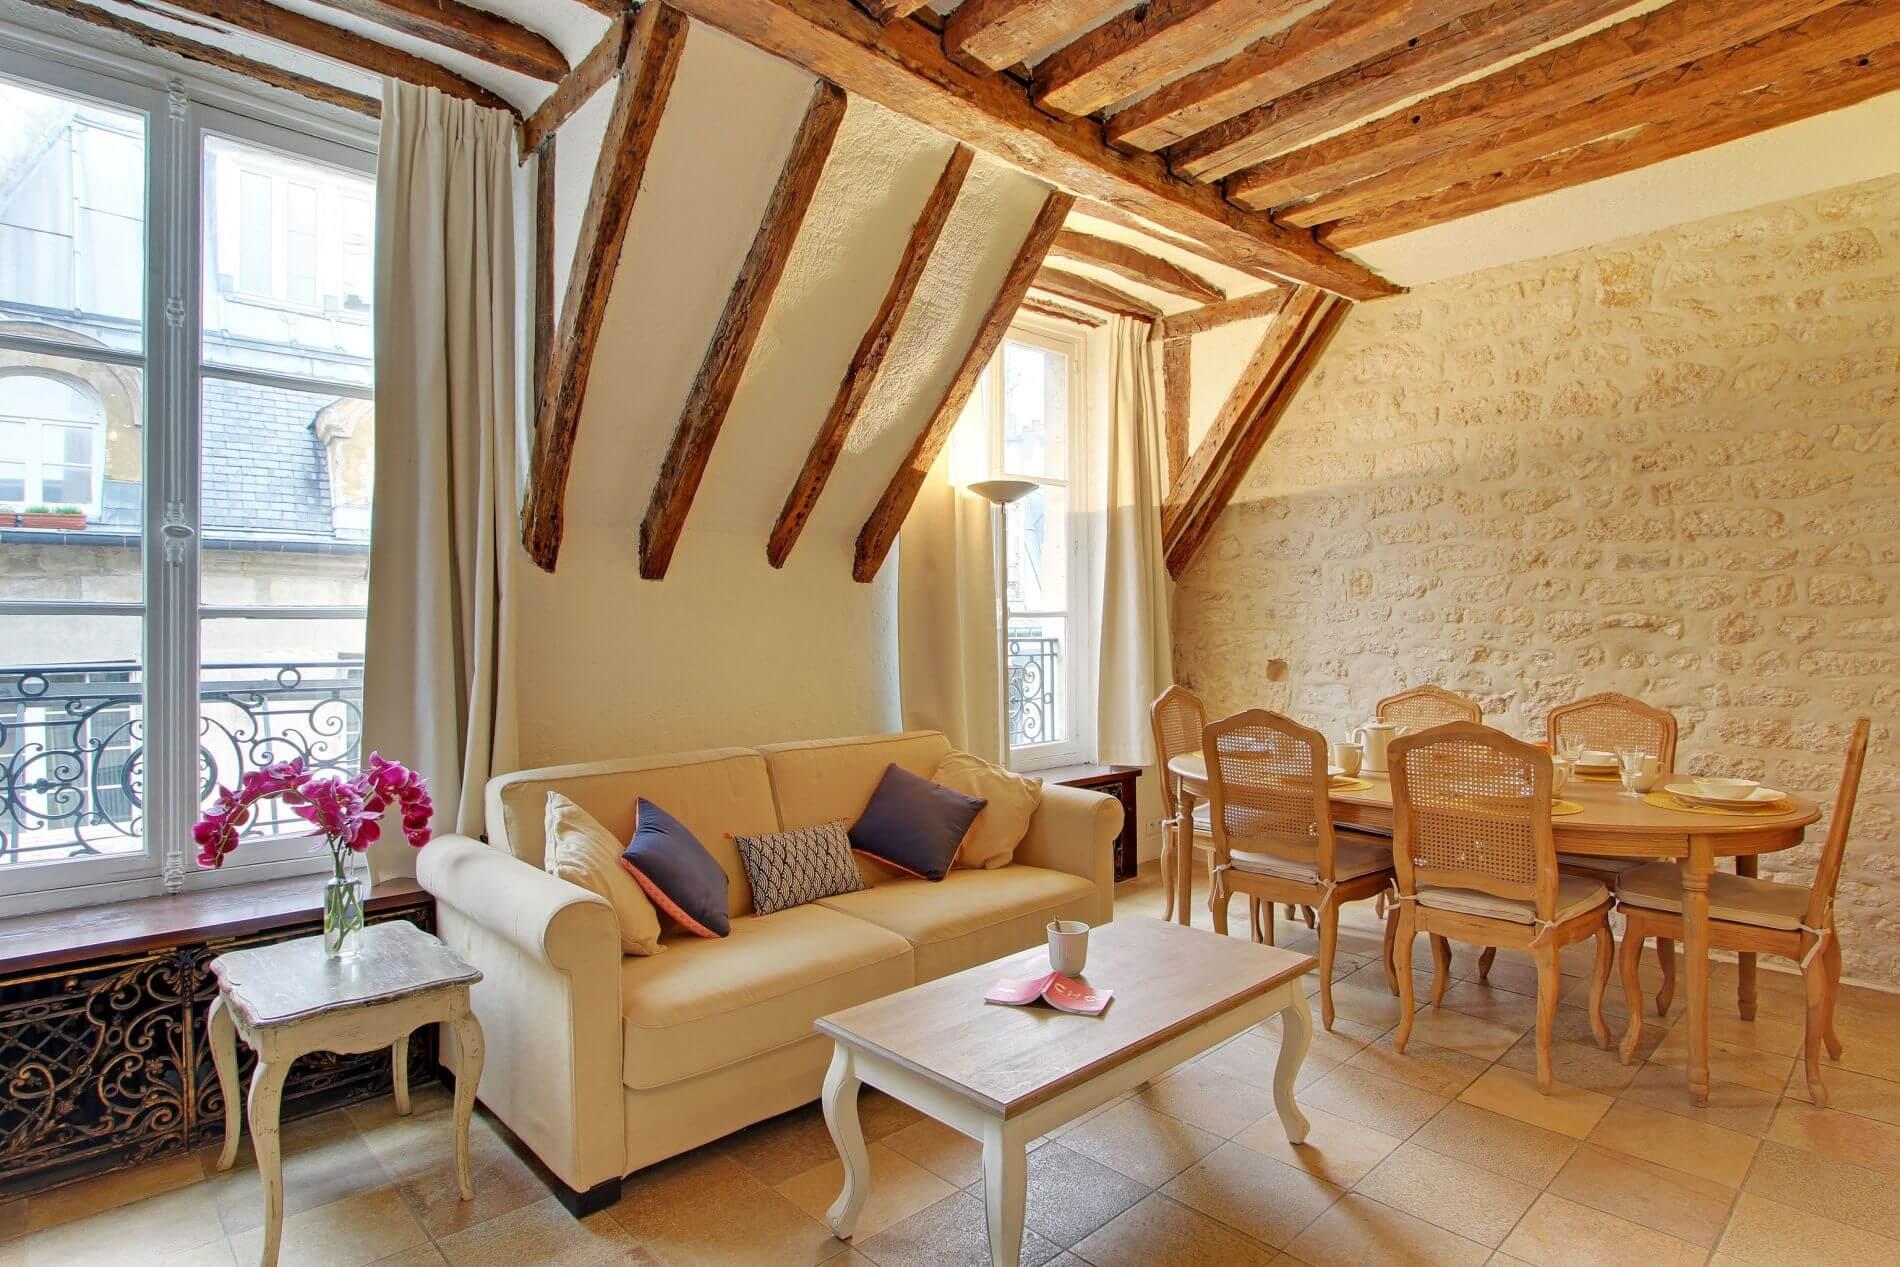 Chaacter-filled serviced apartment near Saint Michel, Paris